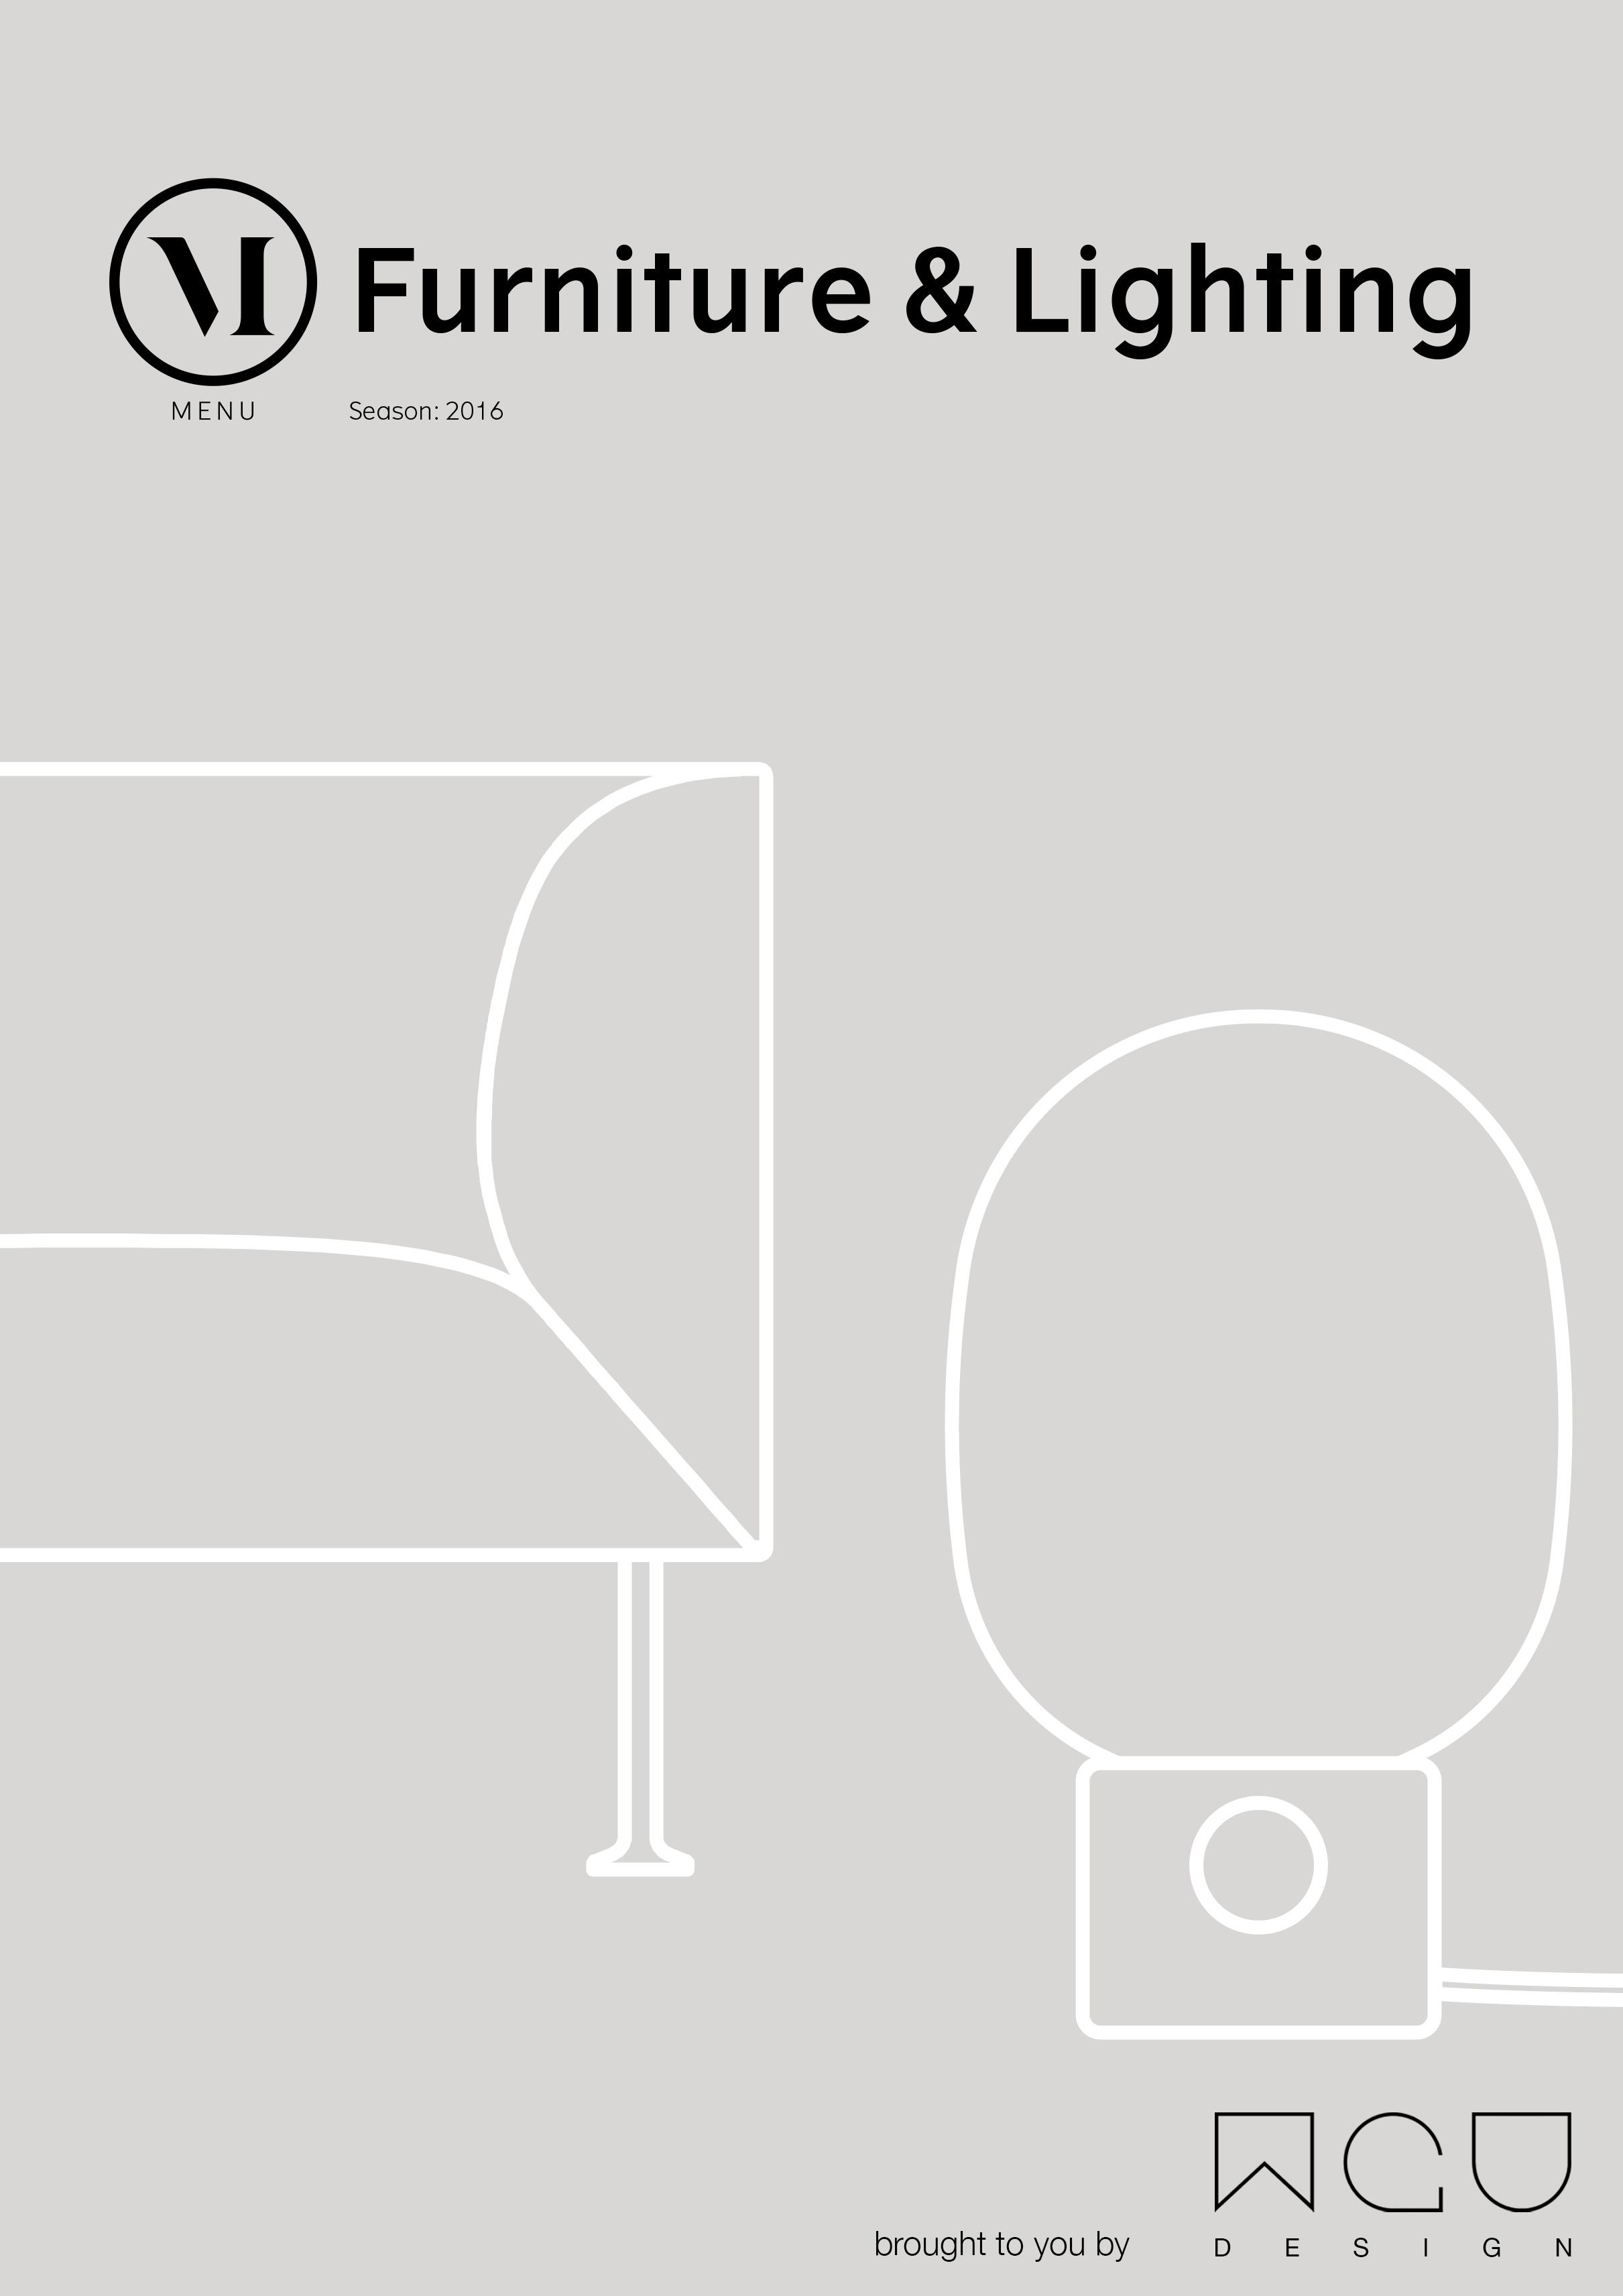 Menu Furniture & Lighting 2016